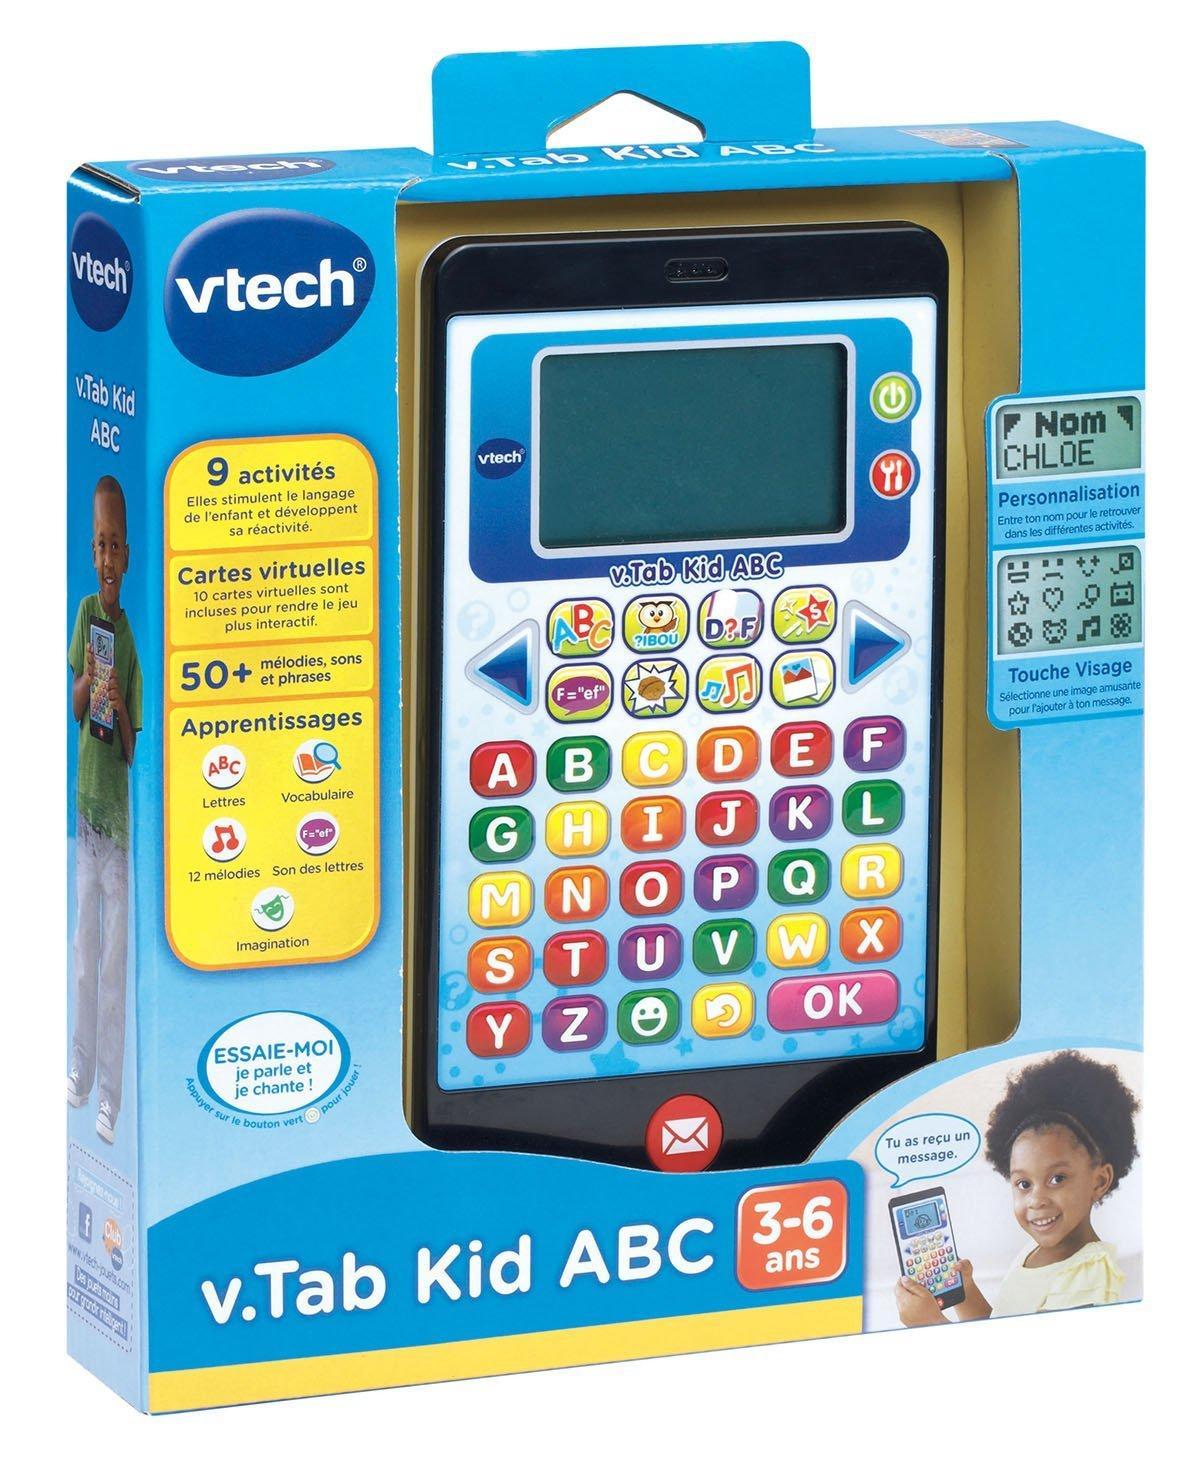 Tablette pour enfant Vtech 169205 V.tab Kid A,B,C